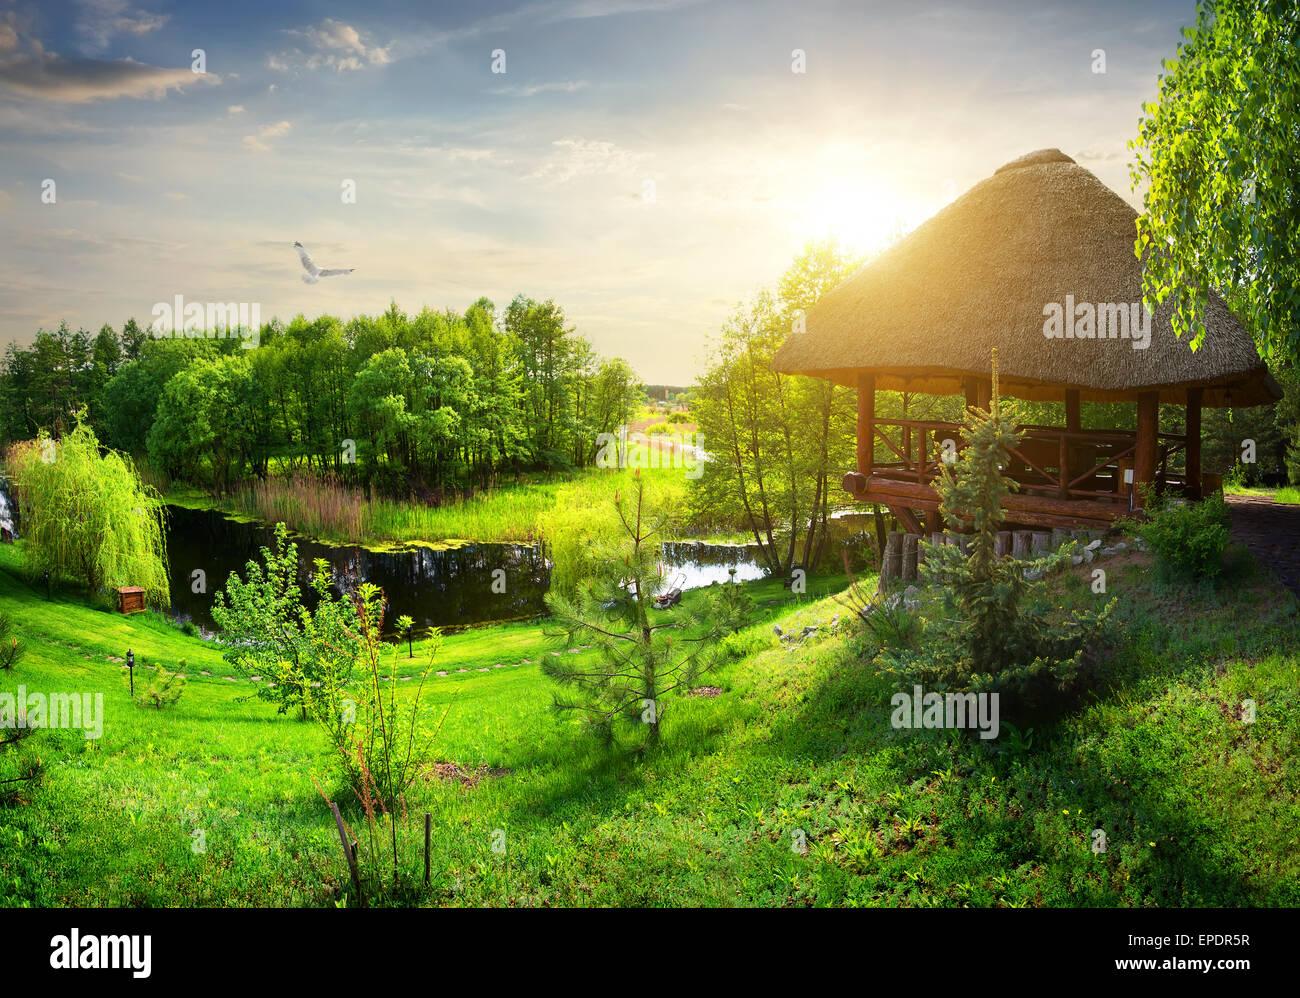 Cenador de madera con techo de paja, cerca de River Imagen De Stock